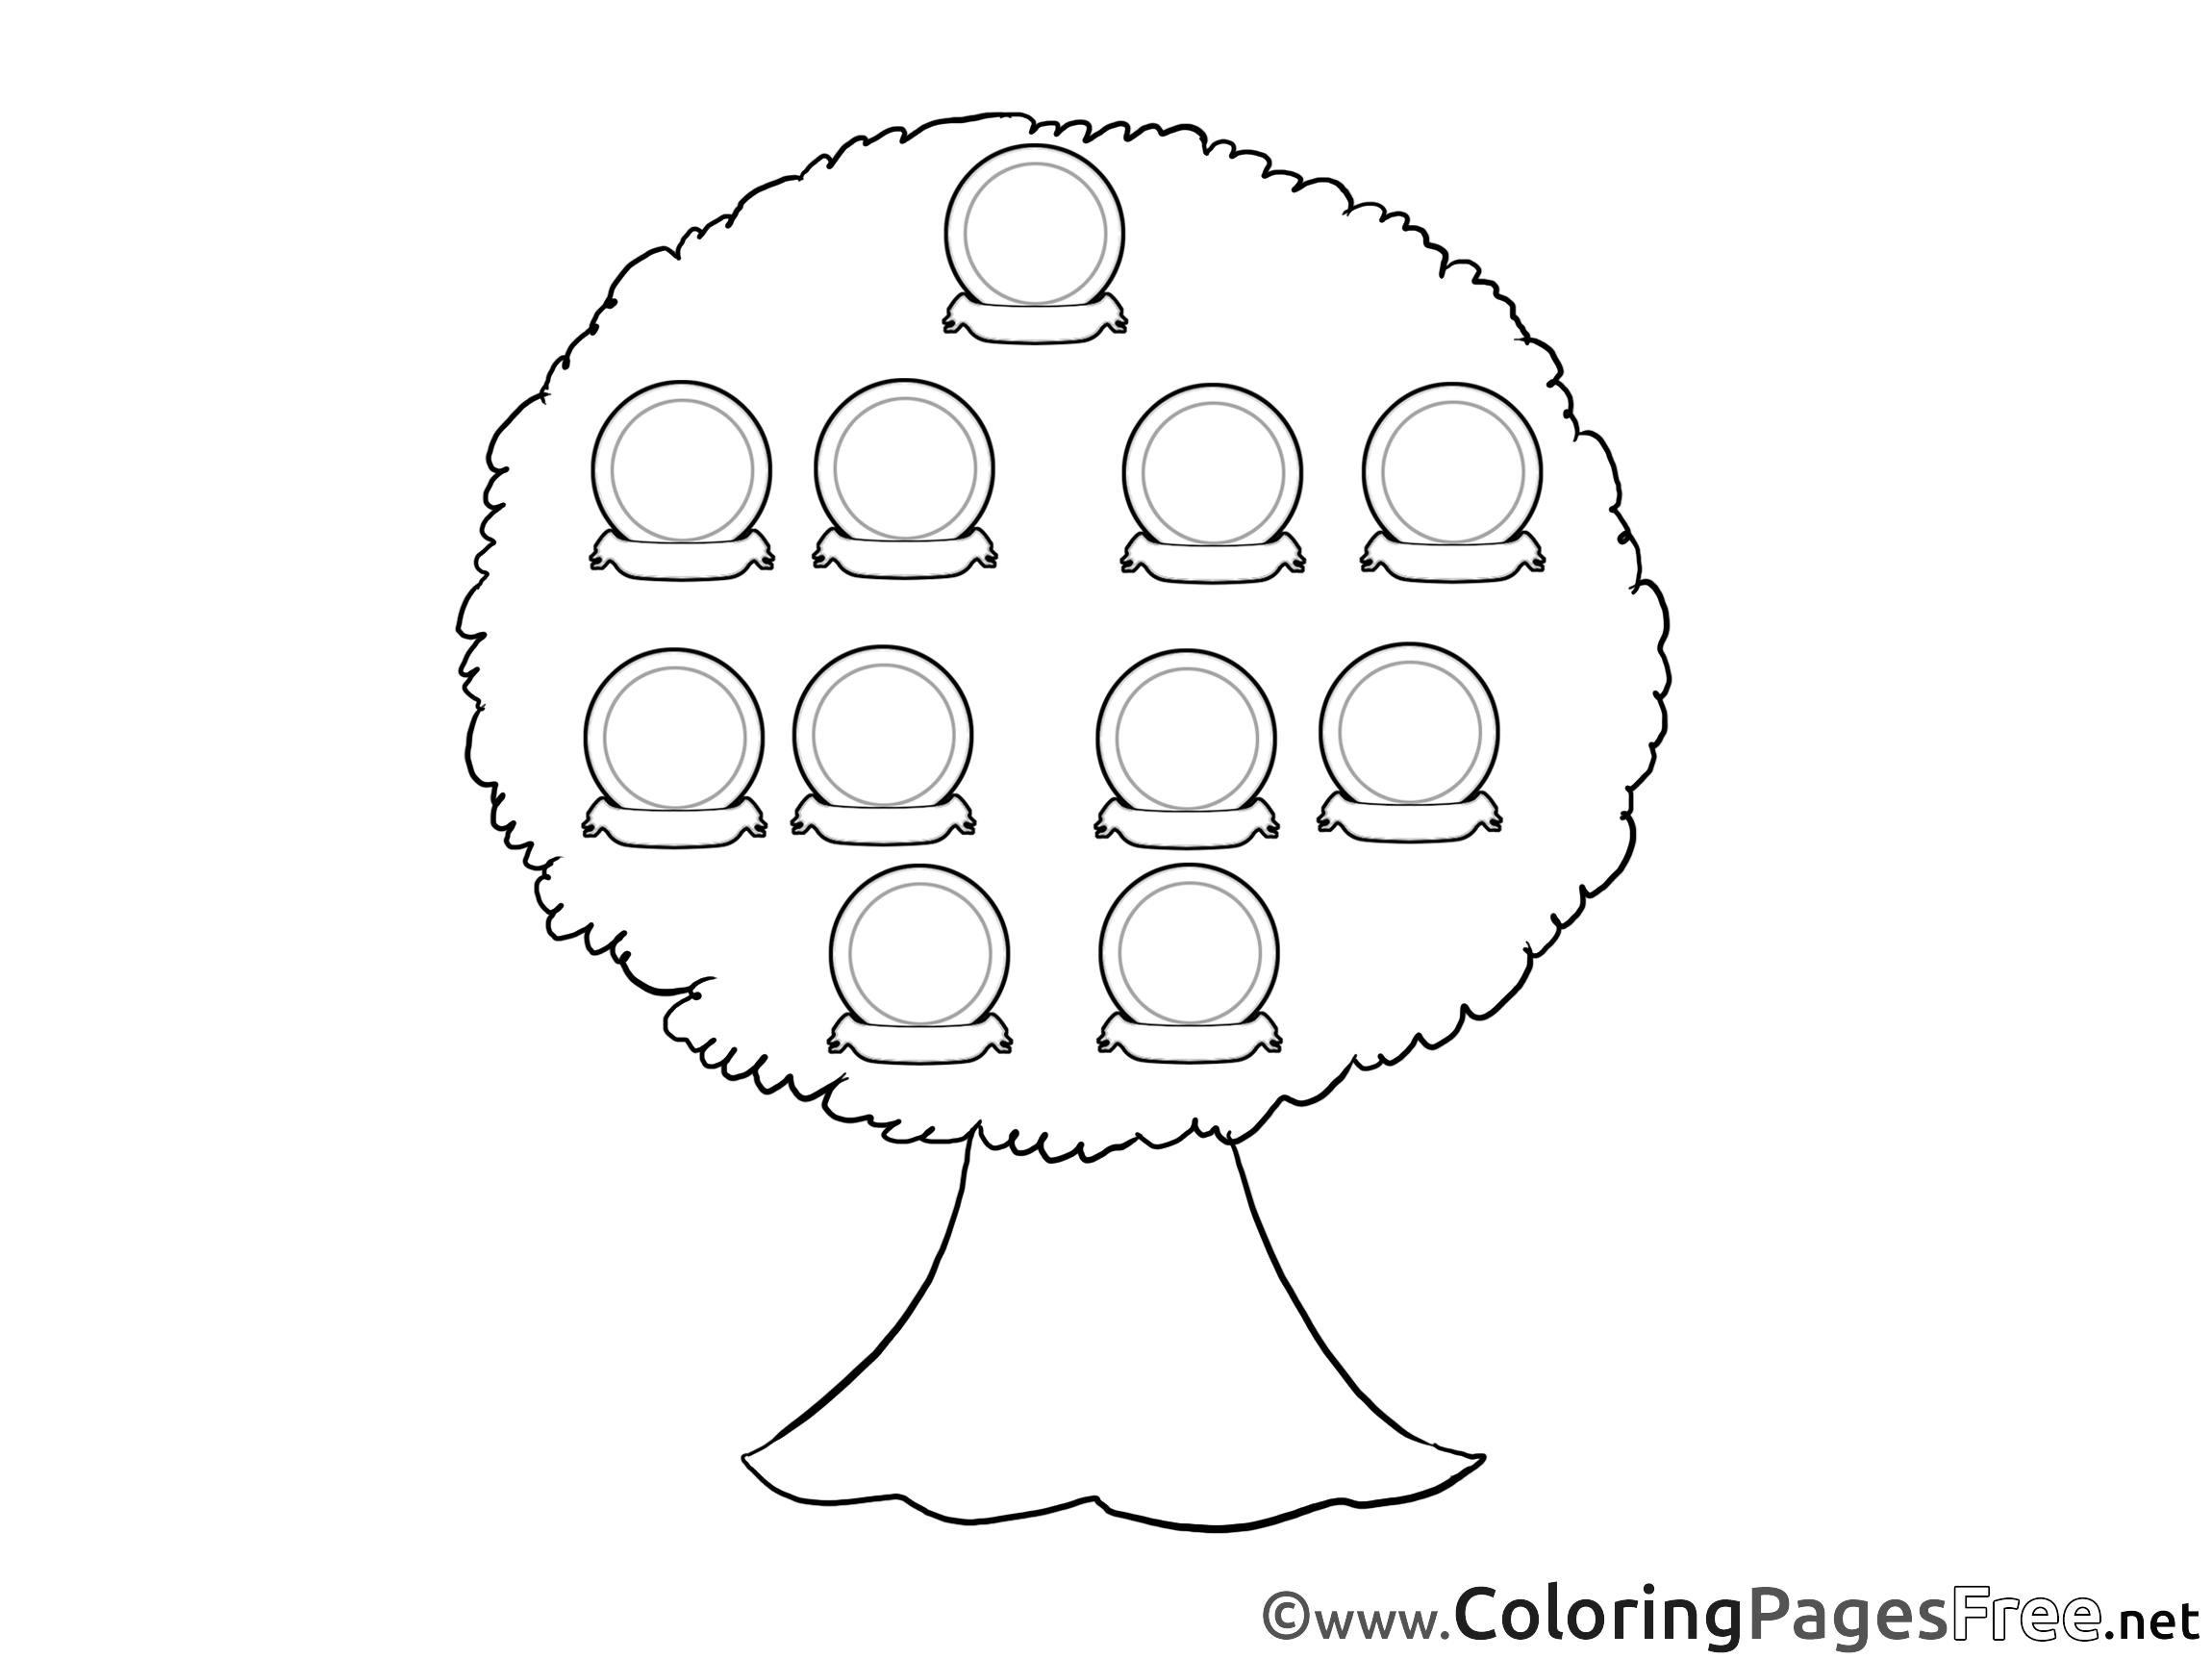 Family Tree Free Printable Coloring Sheets